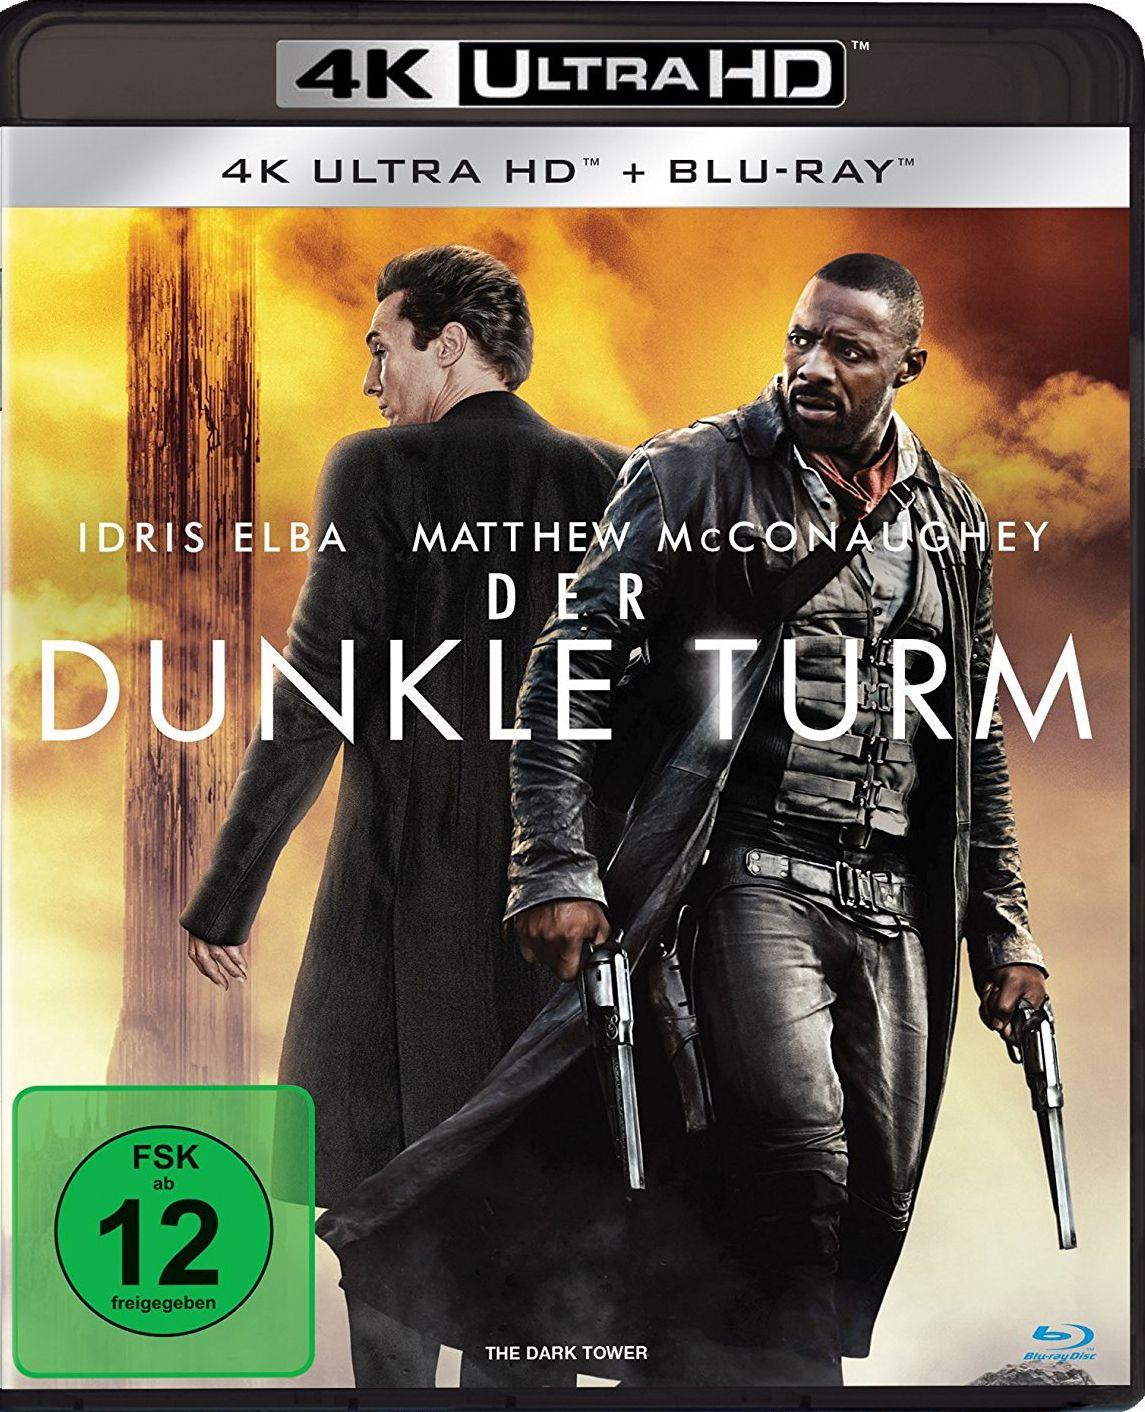 Dunkle Turm, Der (2 Discs) (UHD BLURAY + BLURAY)